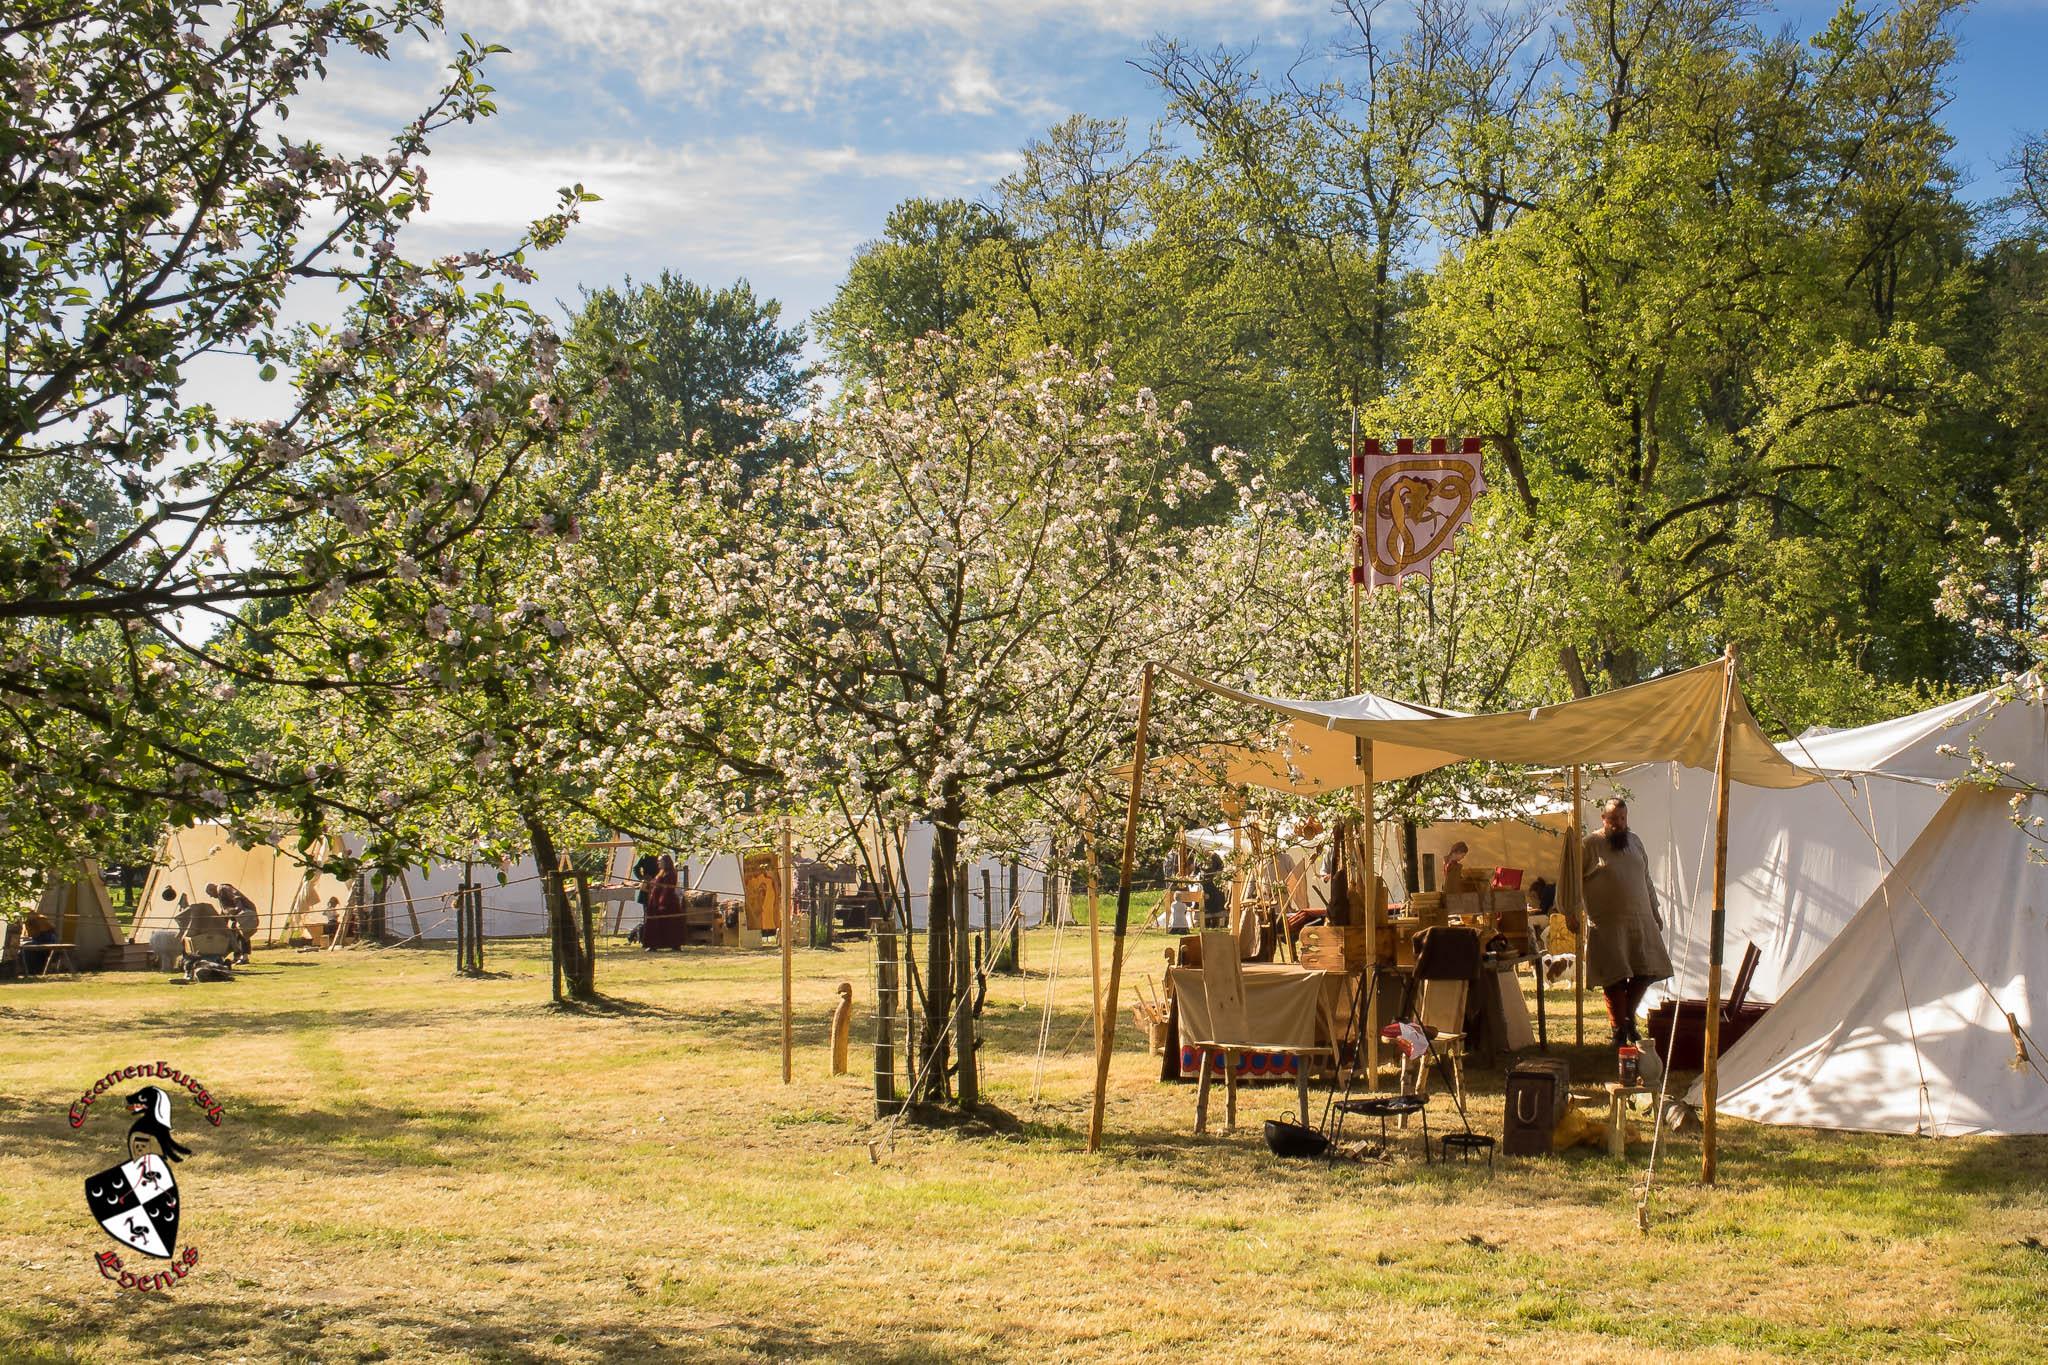 Middeleeuws-Festijn-Cannenburgh-2018-Algemeen-Ellen-la-Faille-3